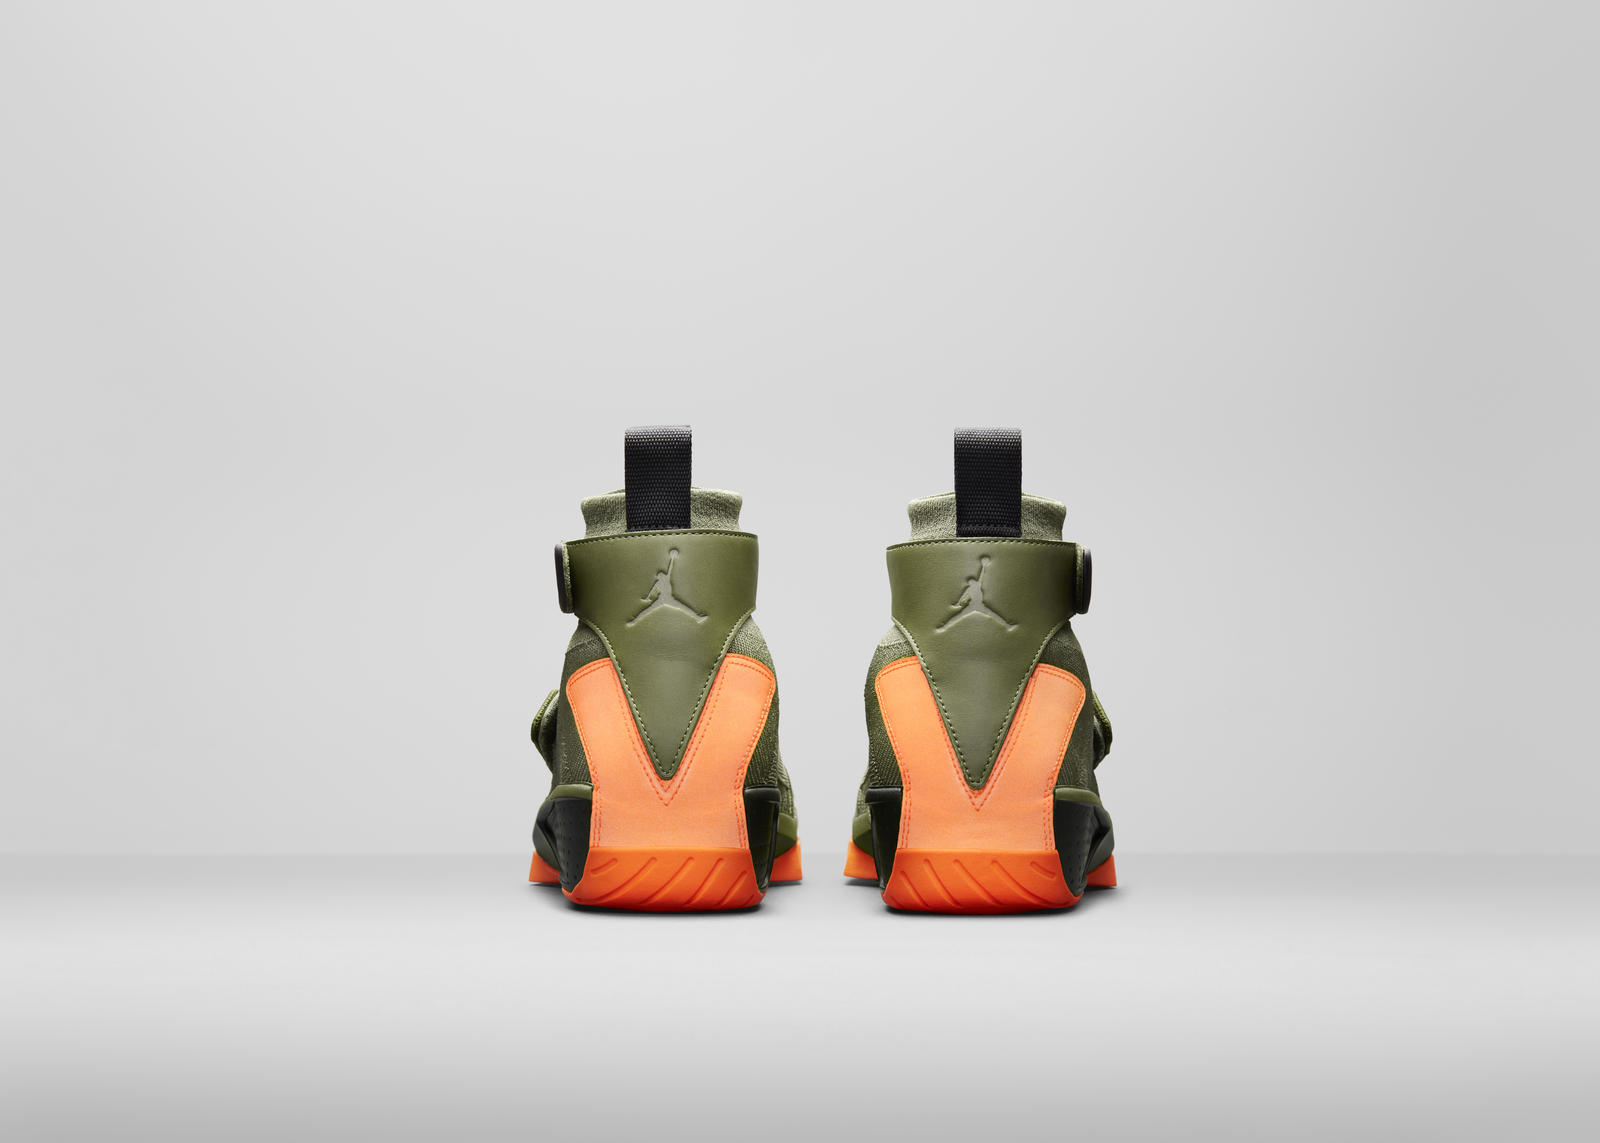 c0d2c0e4c463 Jordan Brand x Carmelo Anthony x Rag   Bone Capsule - Nike News